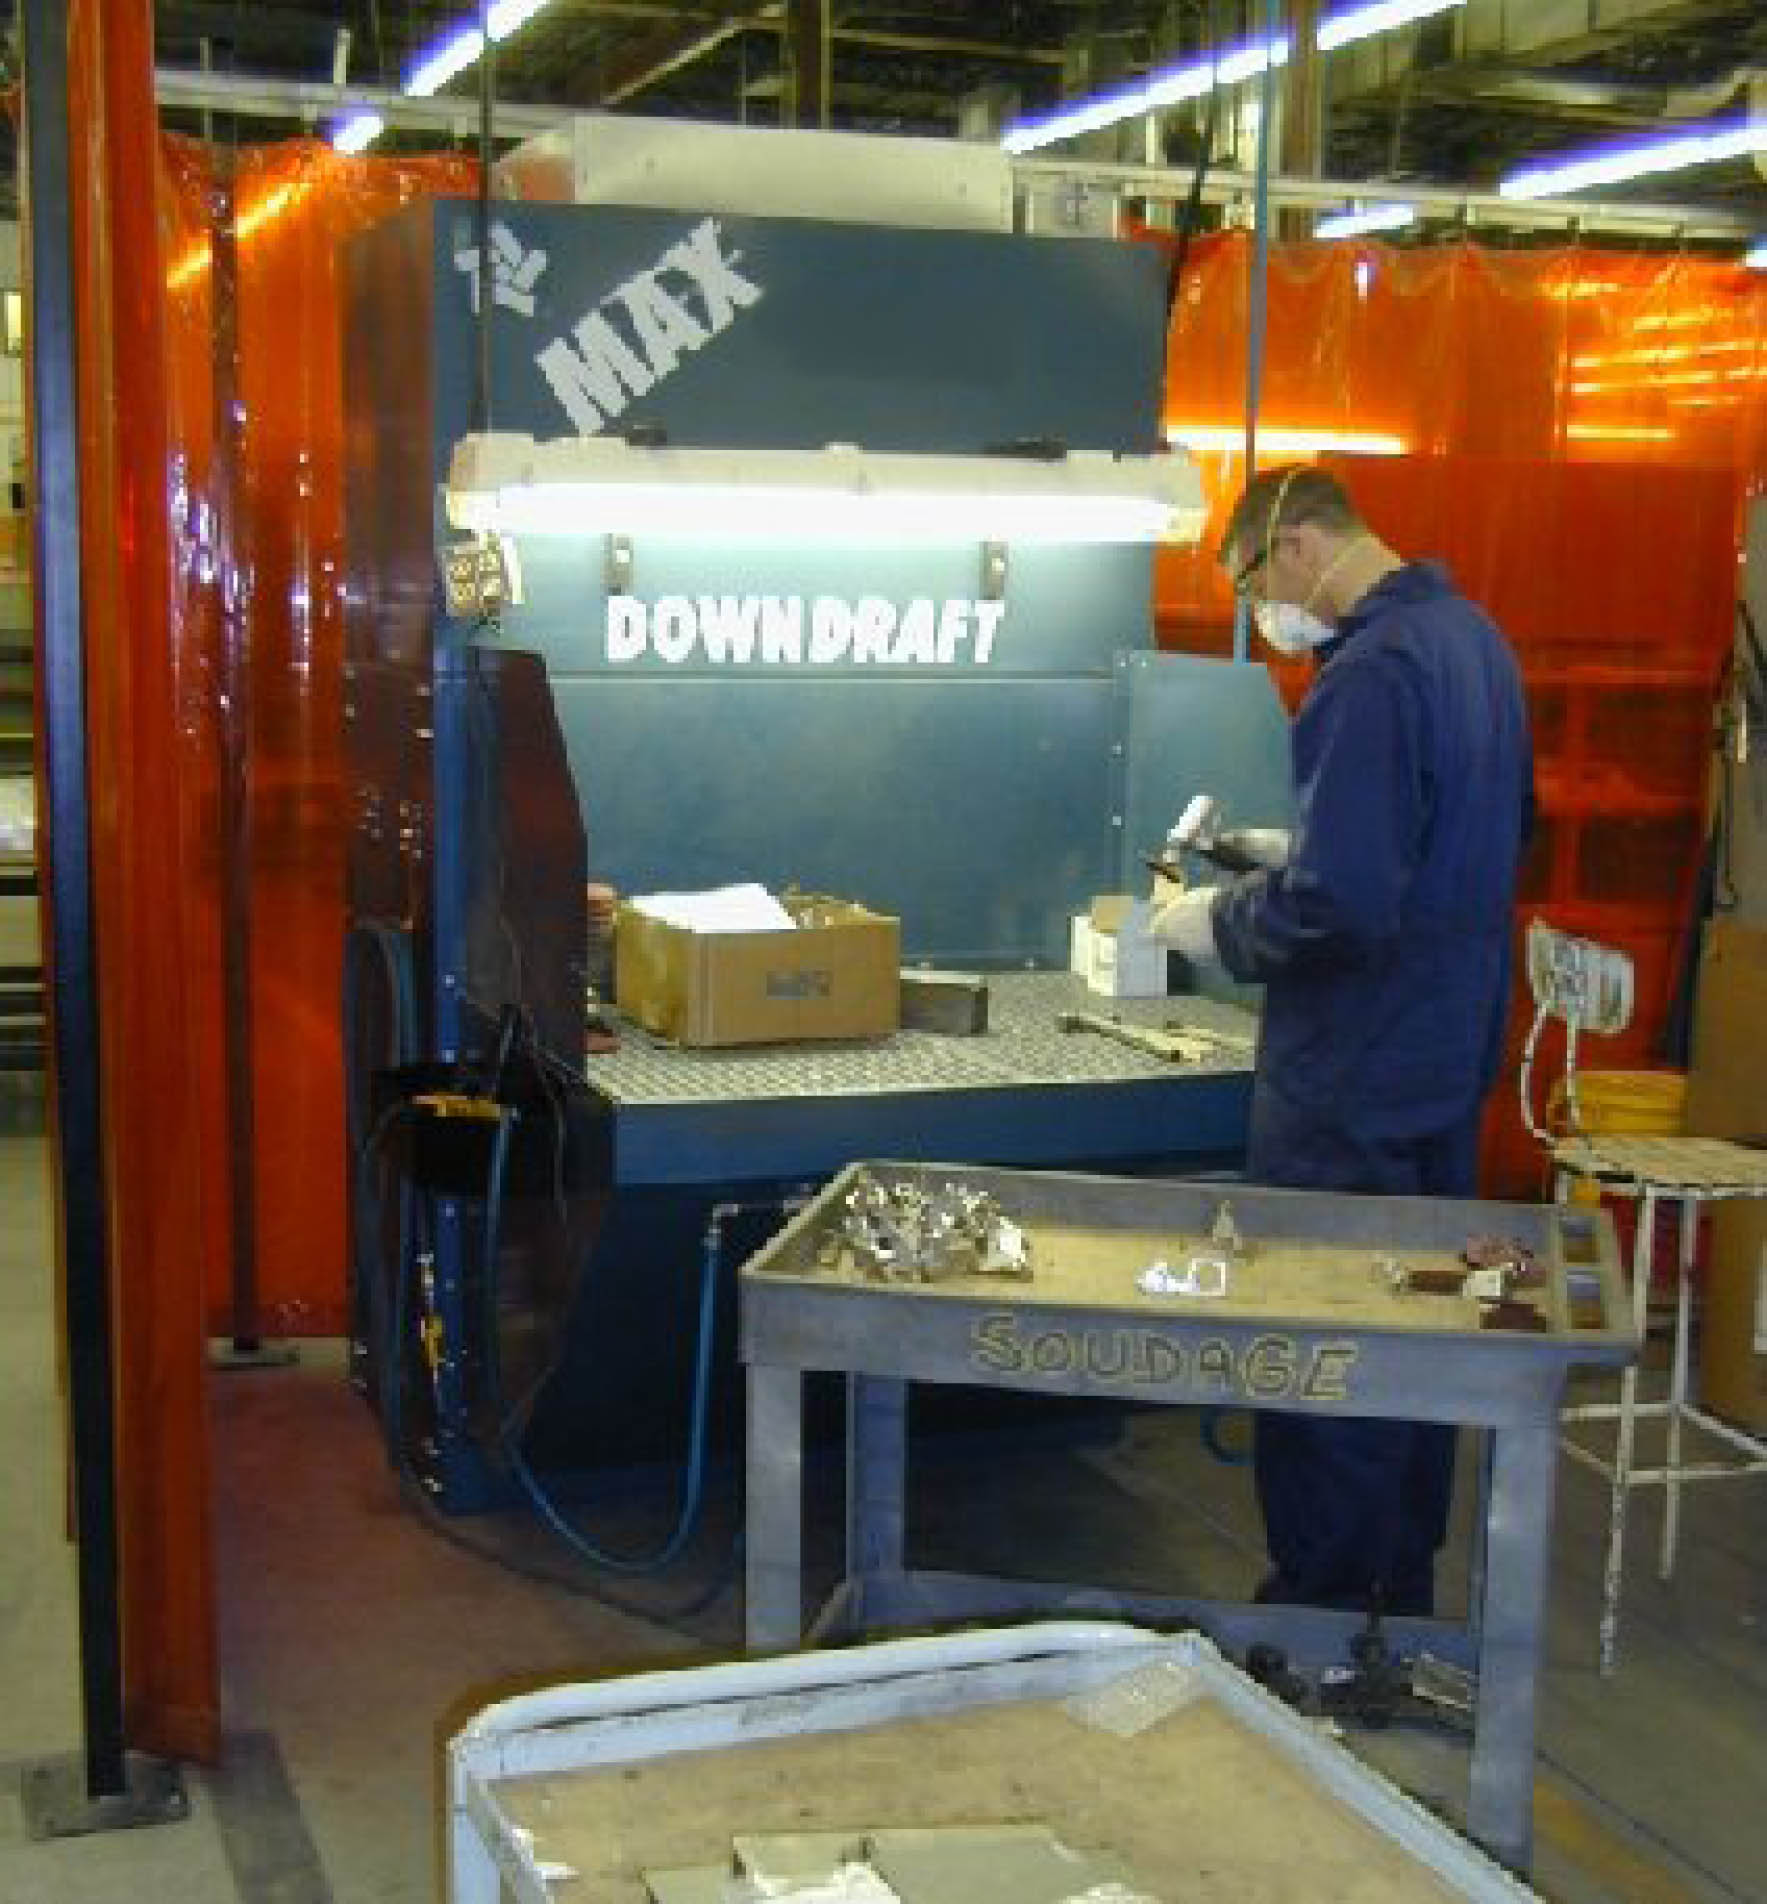 Downdraft Tables Grinding Dust Downdraft Tables | Texas Electronics Canada Inc.